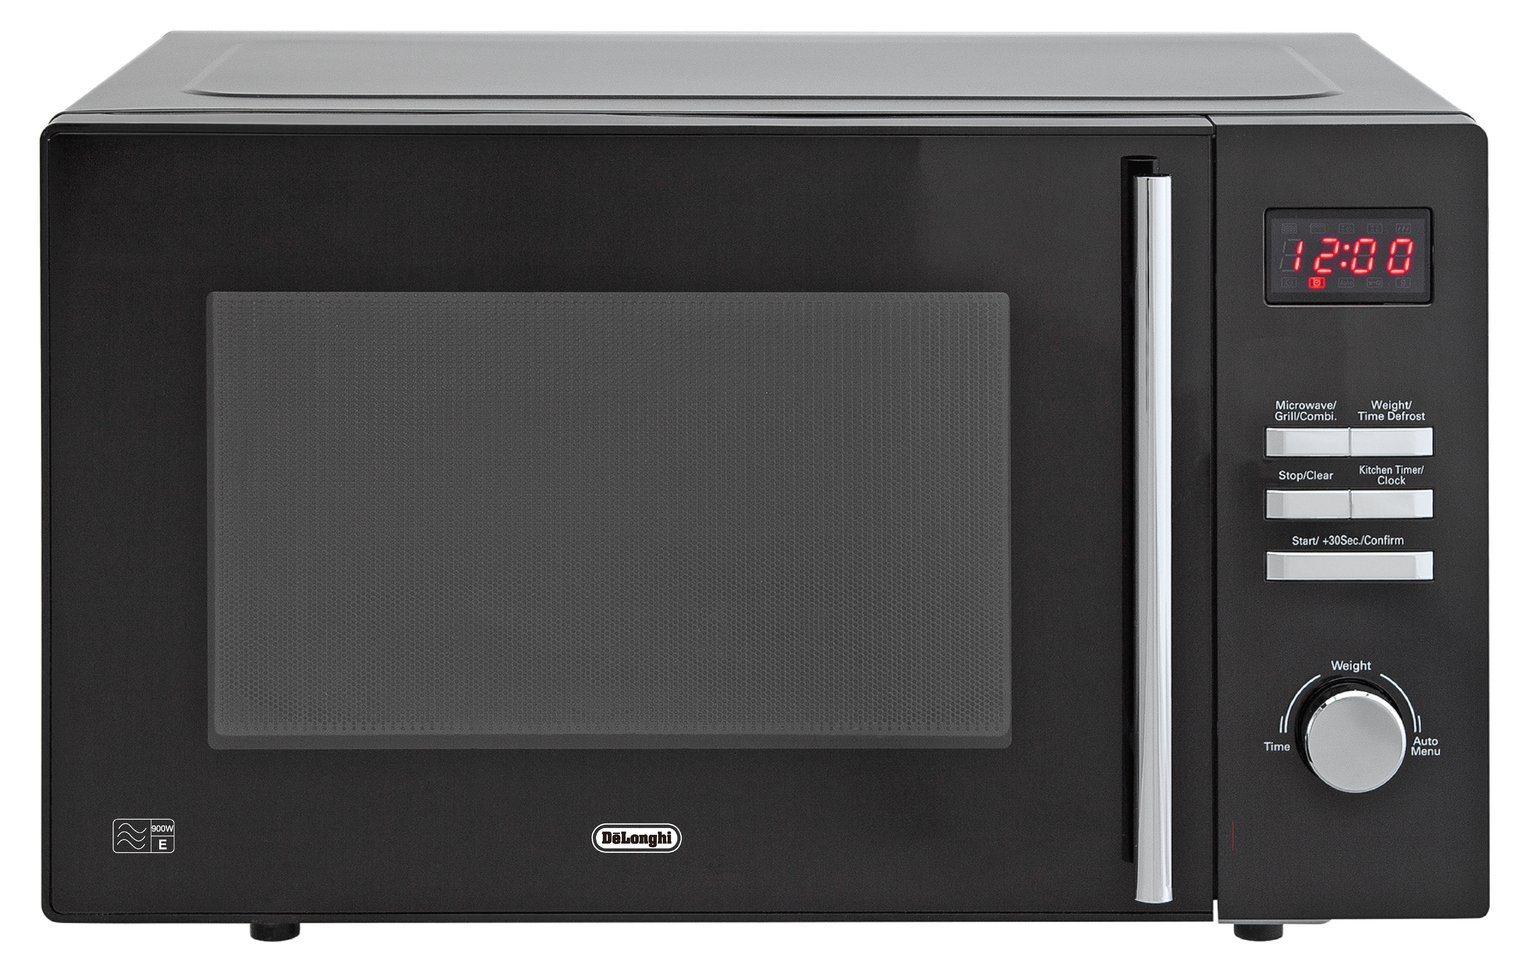 De'Longhi 900W Microwave with Grill AM820C - Black